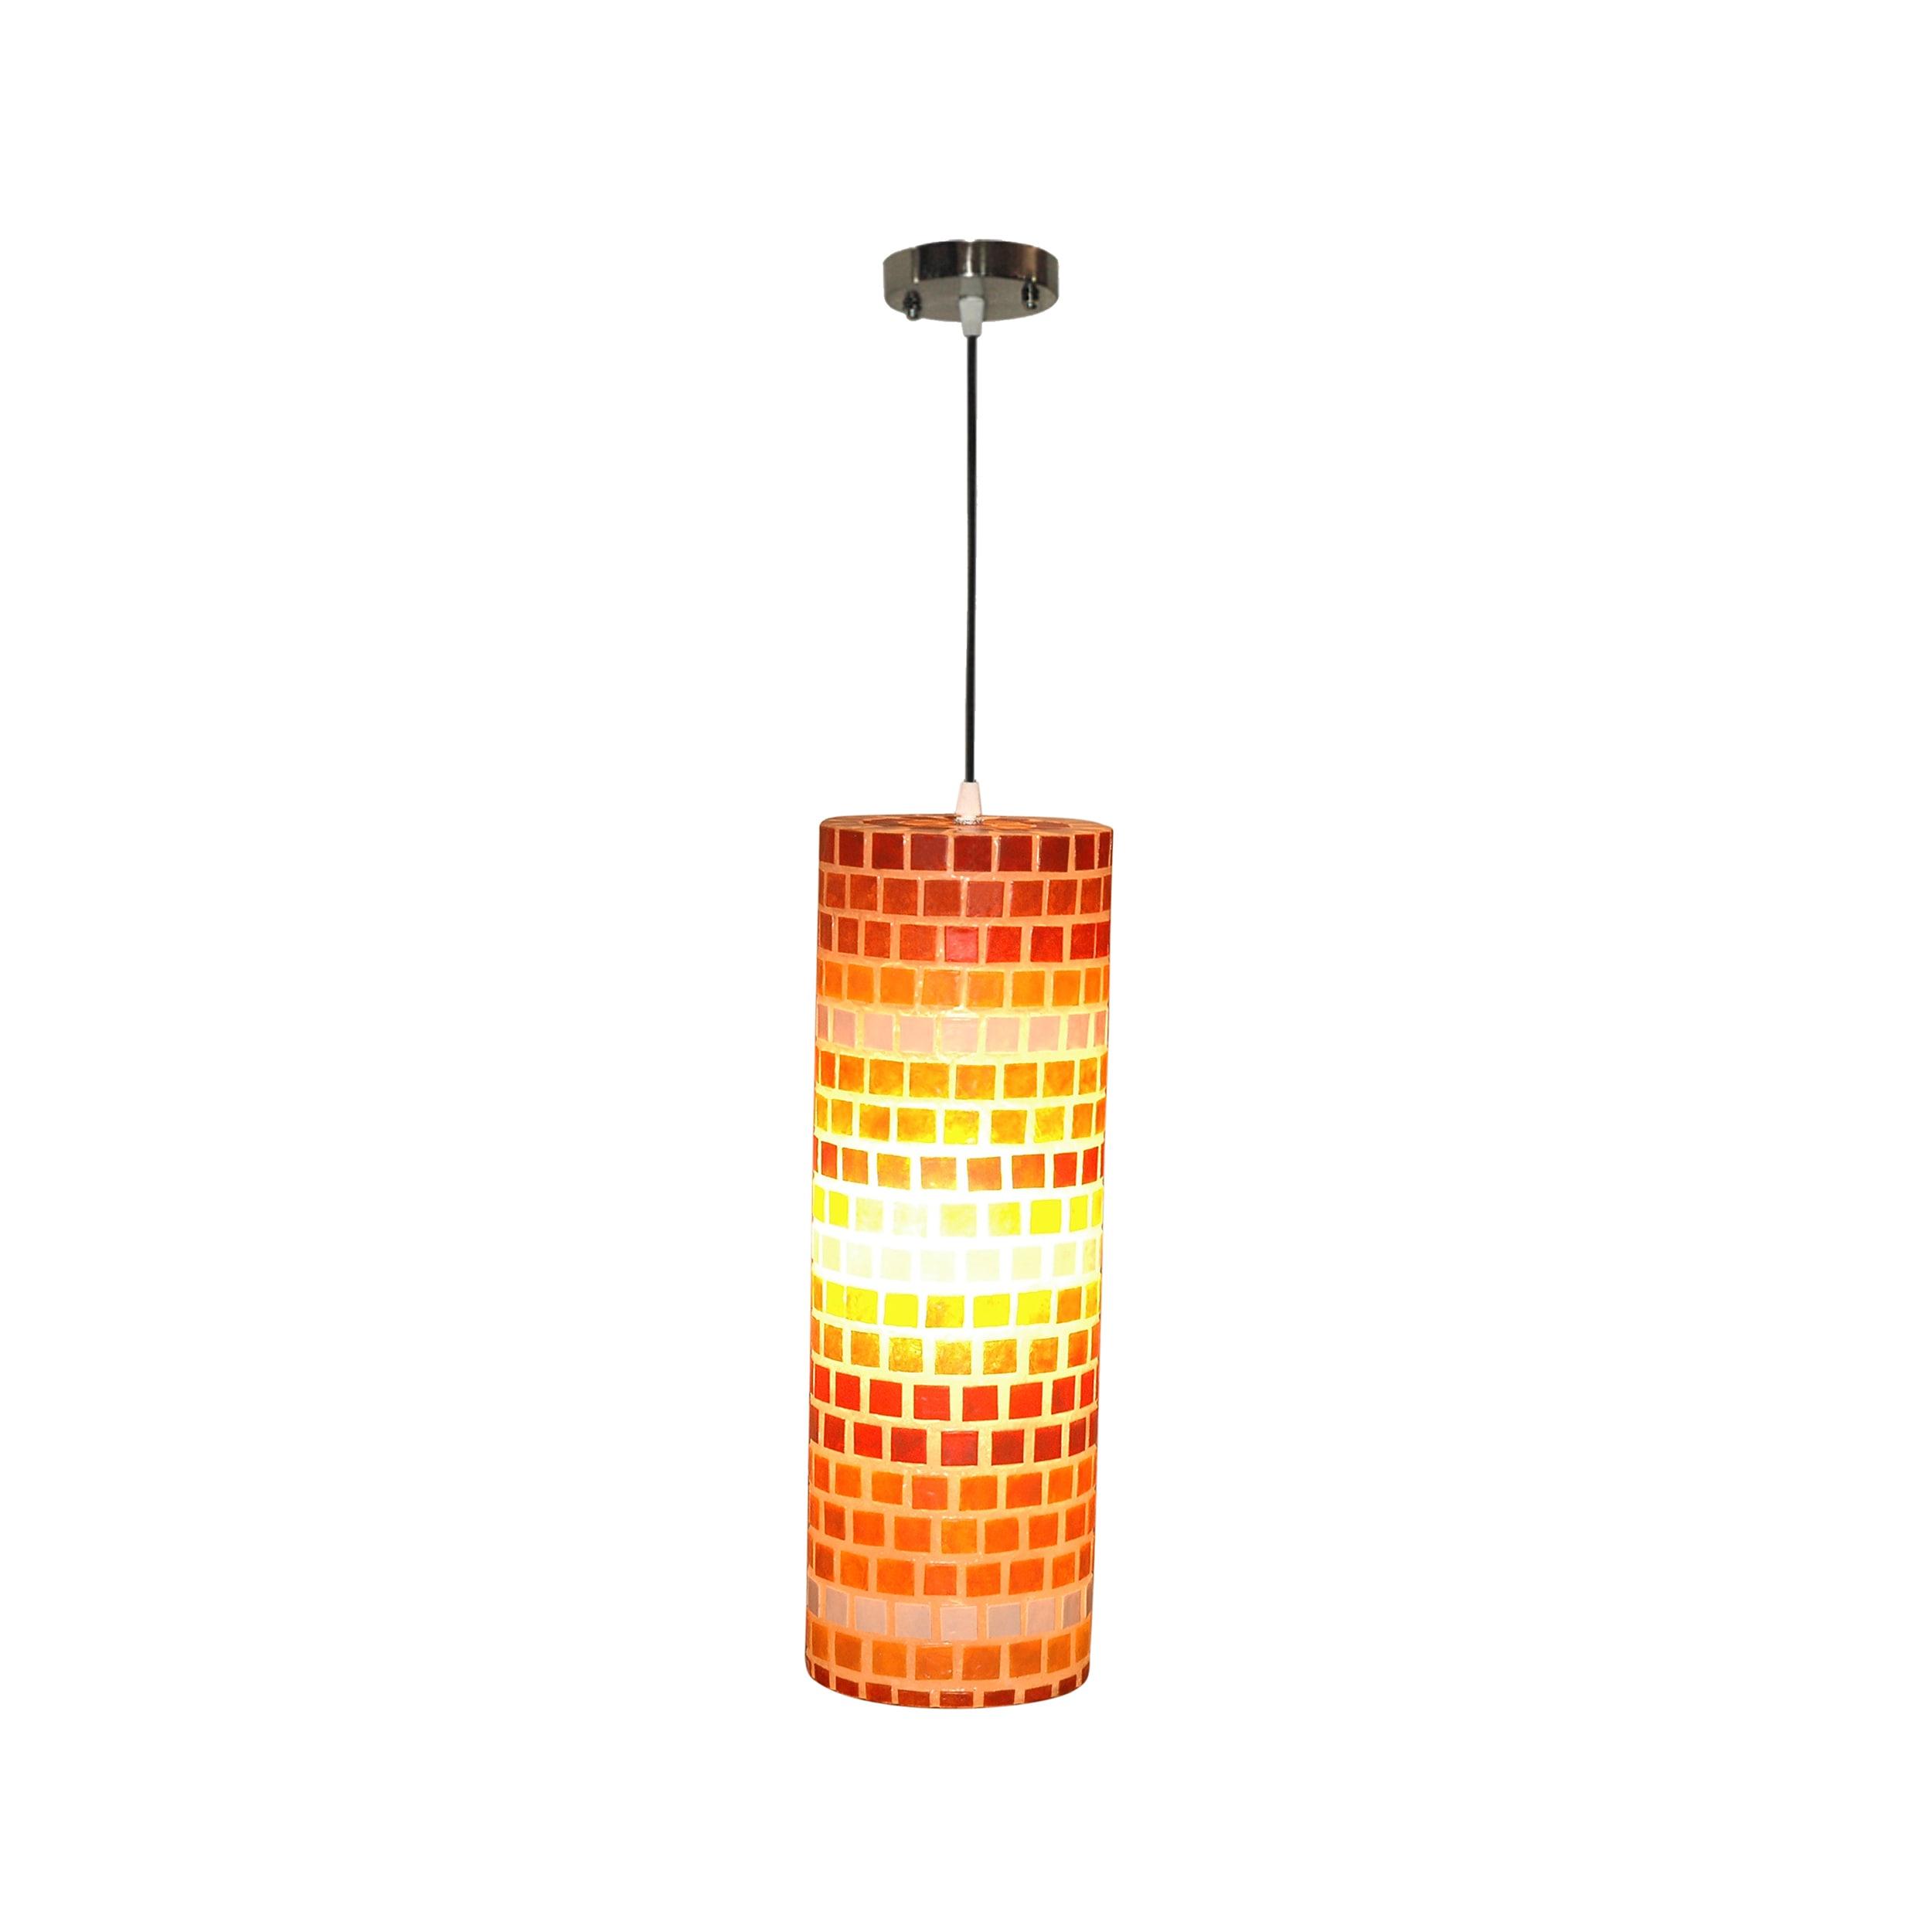 Decorative Orange Contemporary Tuscan Mosaic Hanging Lamp